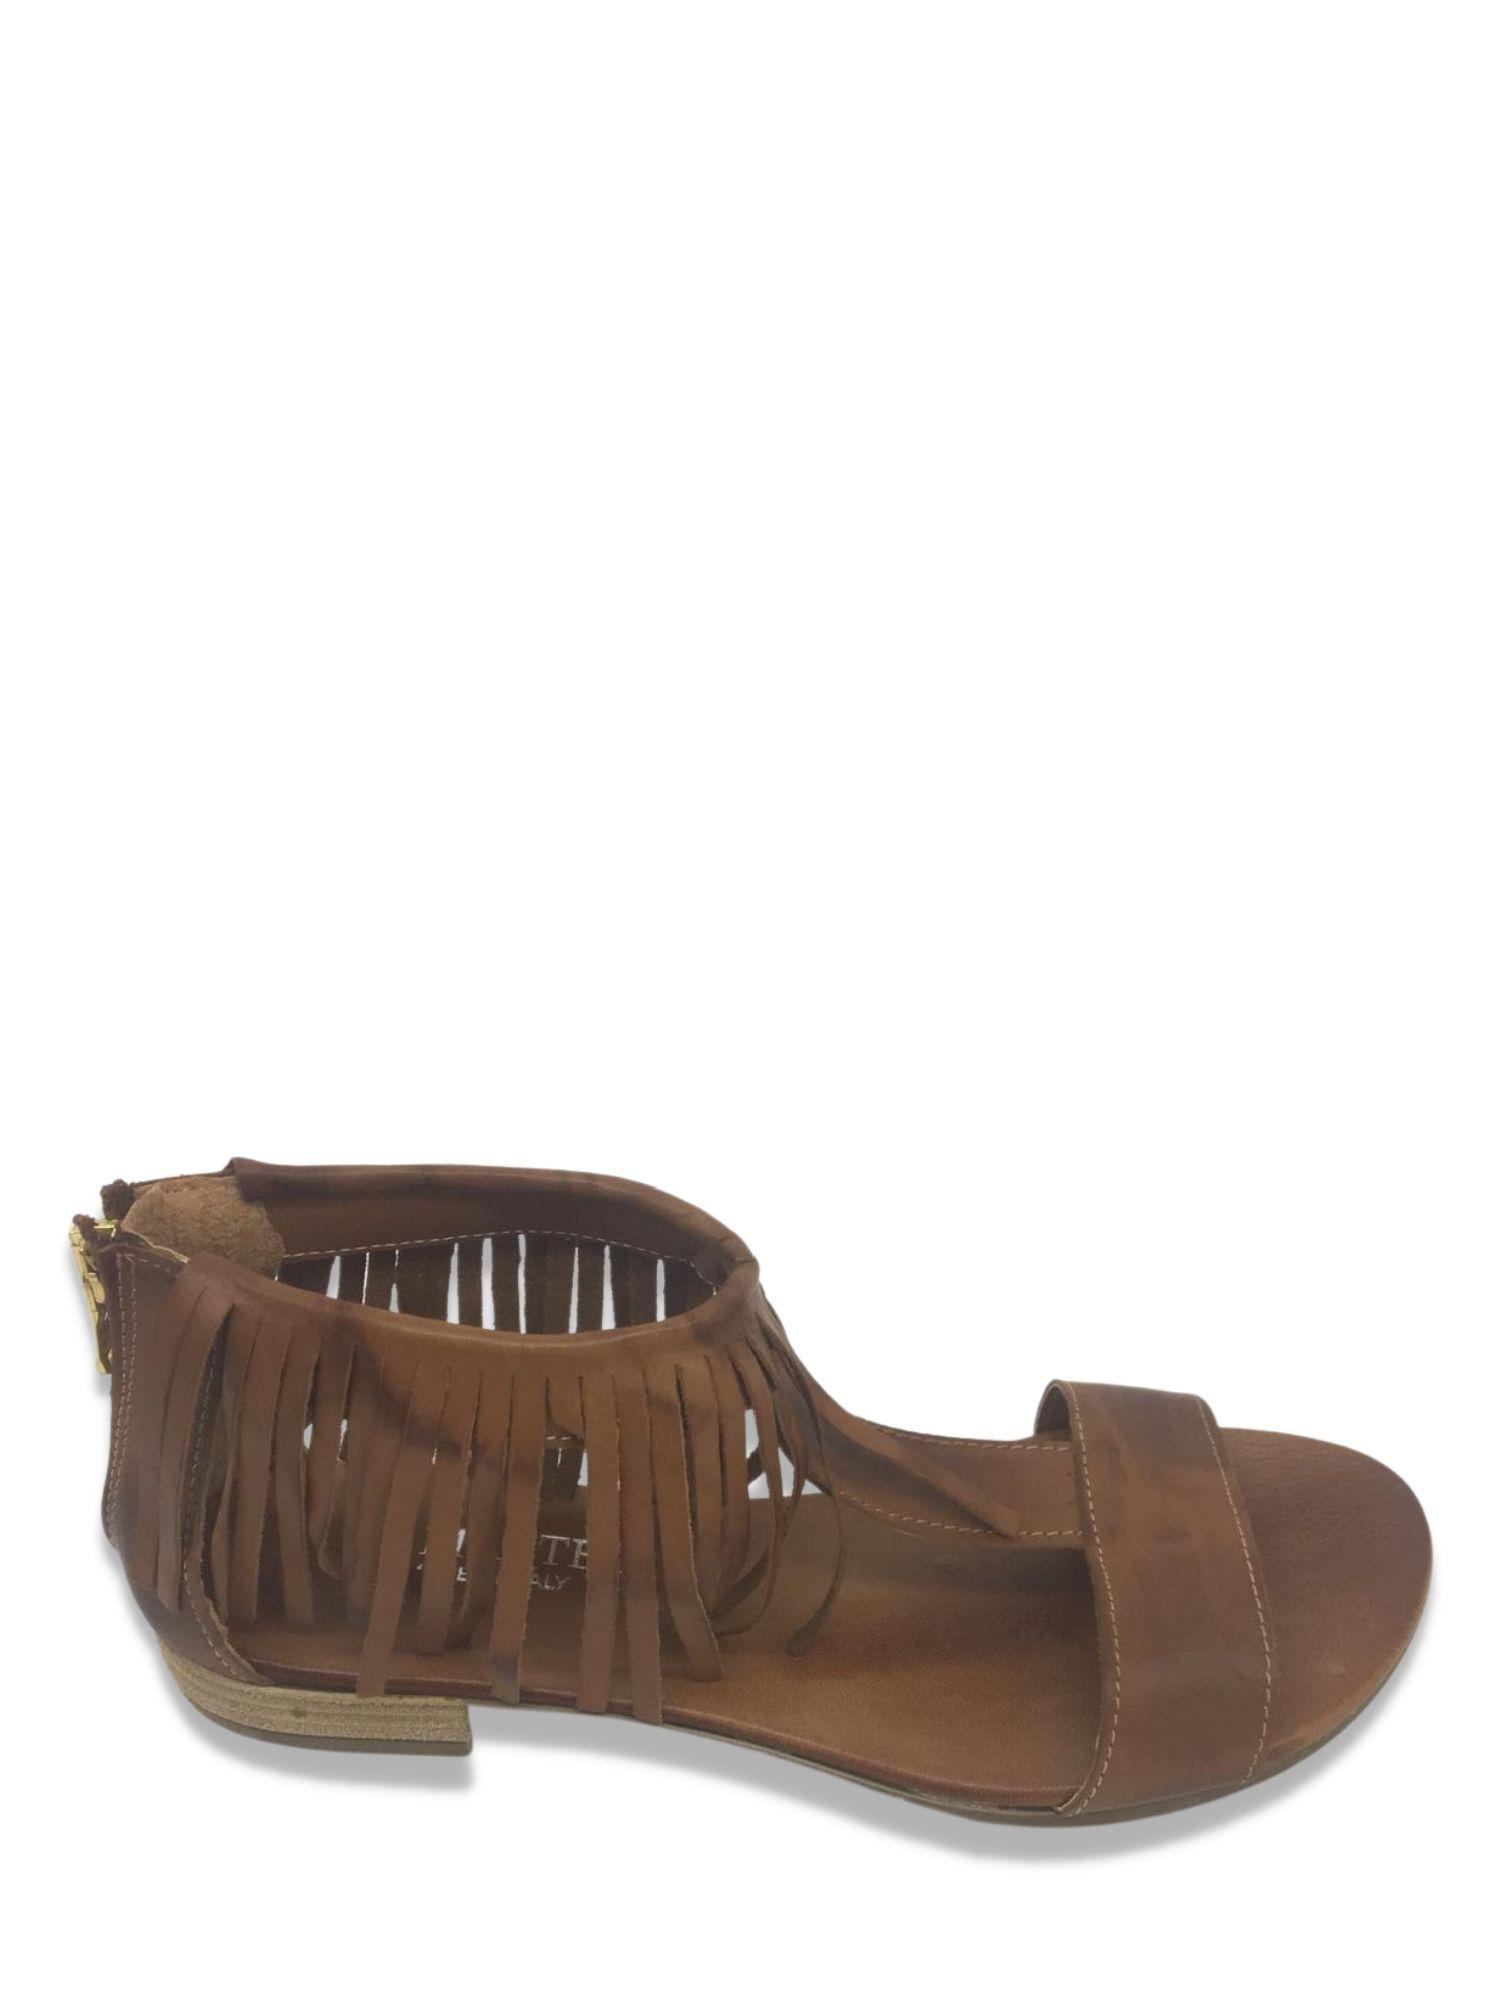 Sandalo infradito Made in Italy 215 cuoio